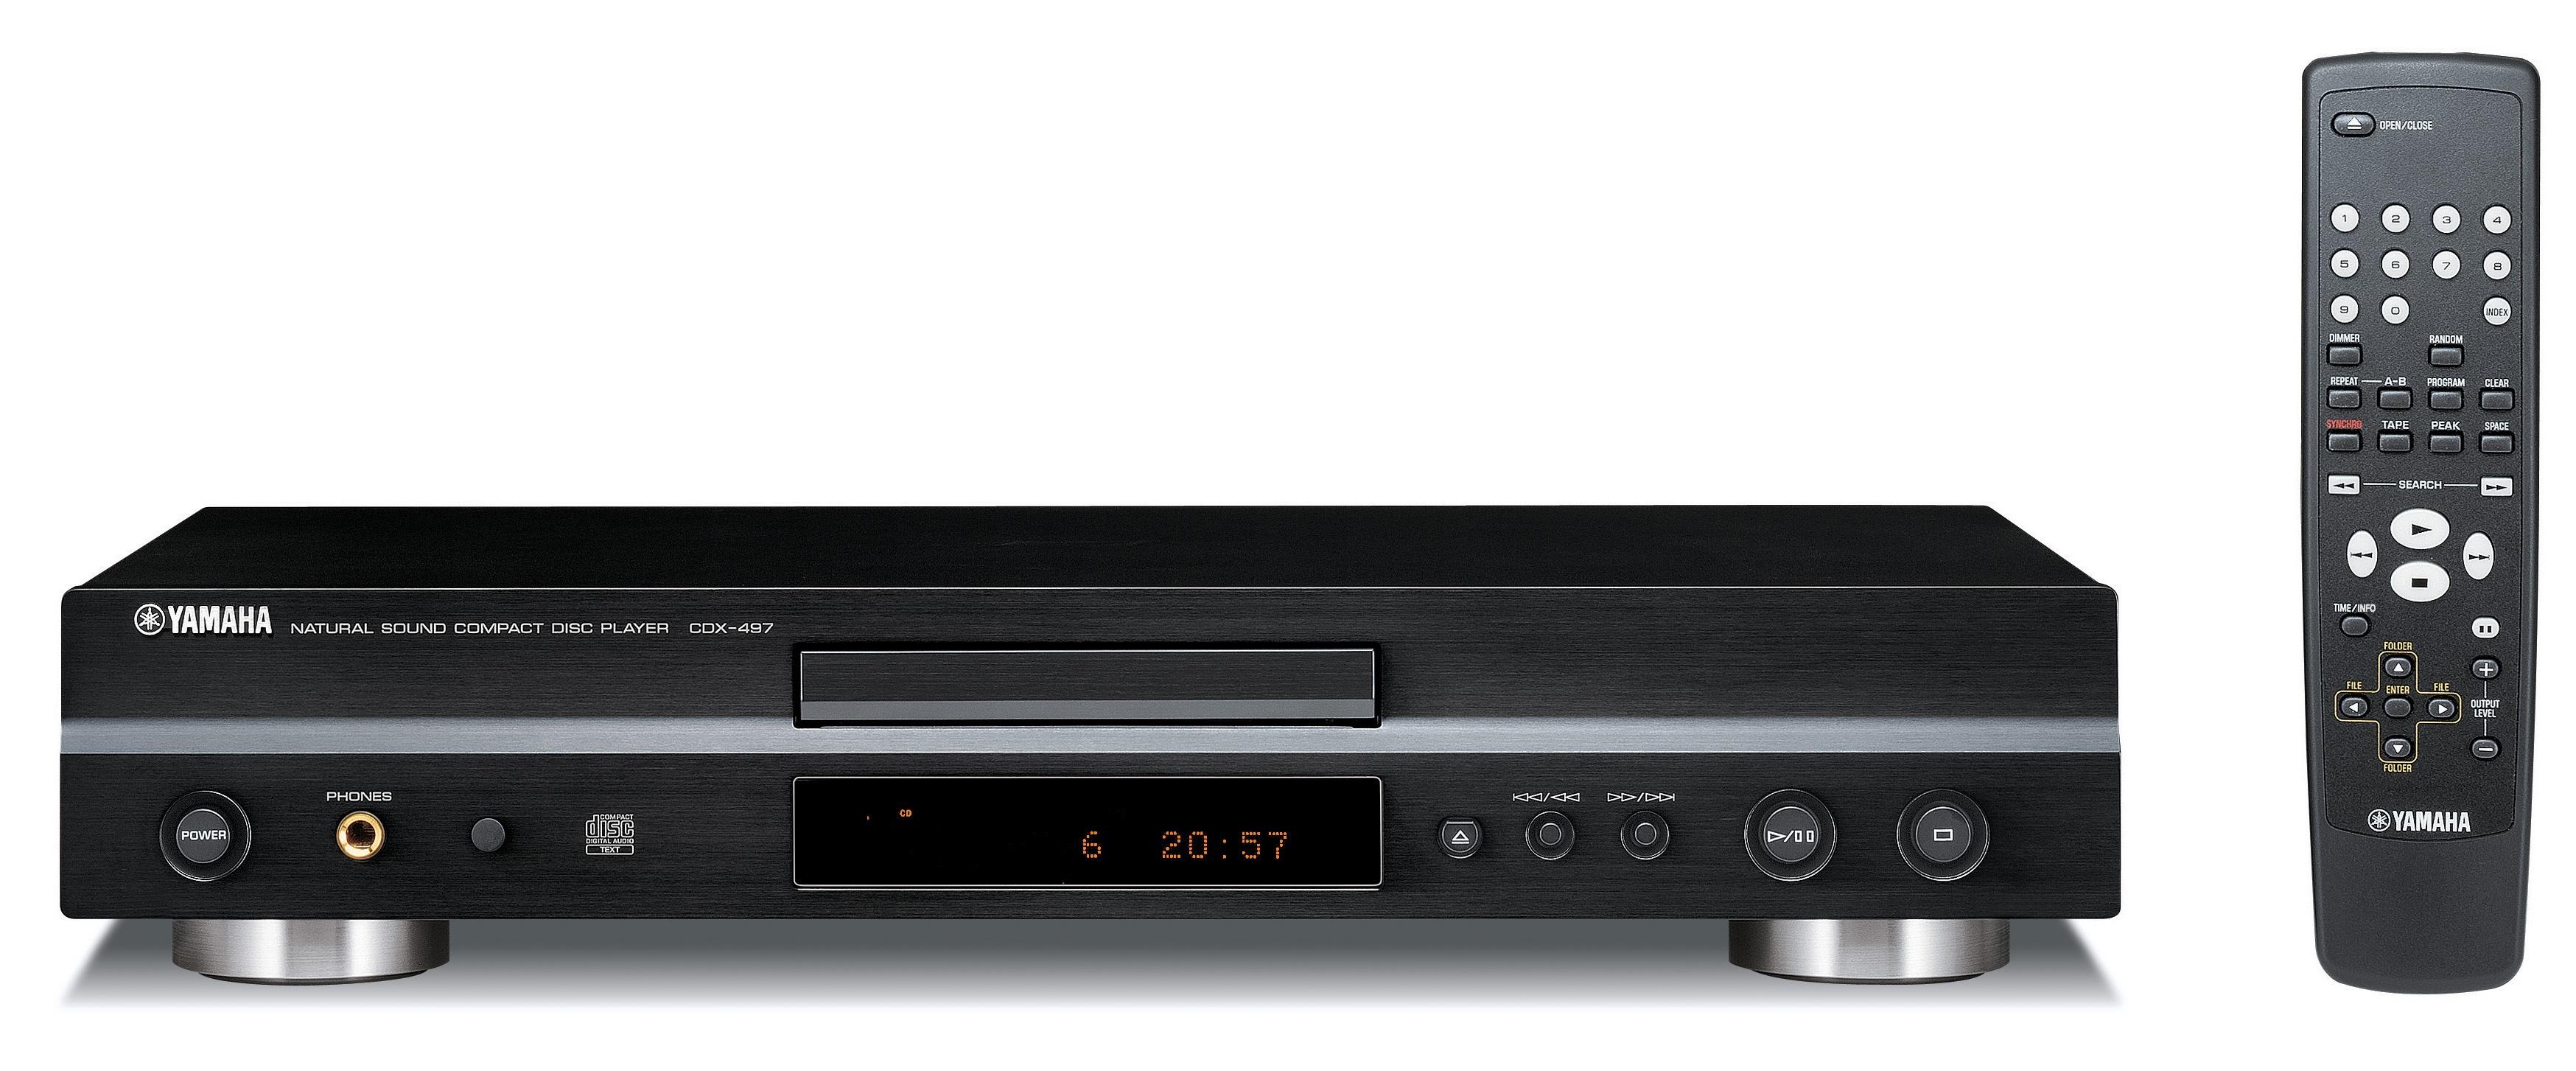 Yamaha CDX-497 - Specificaties